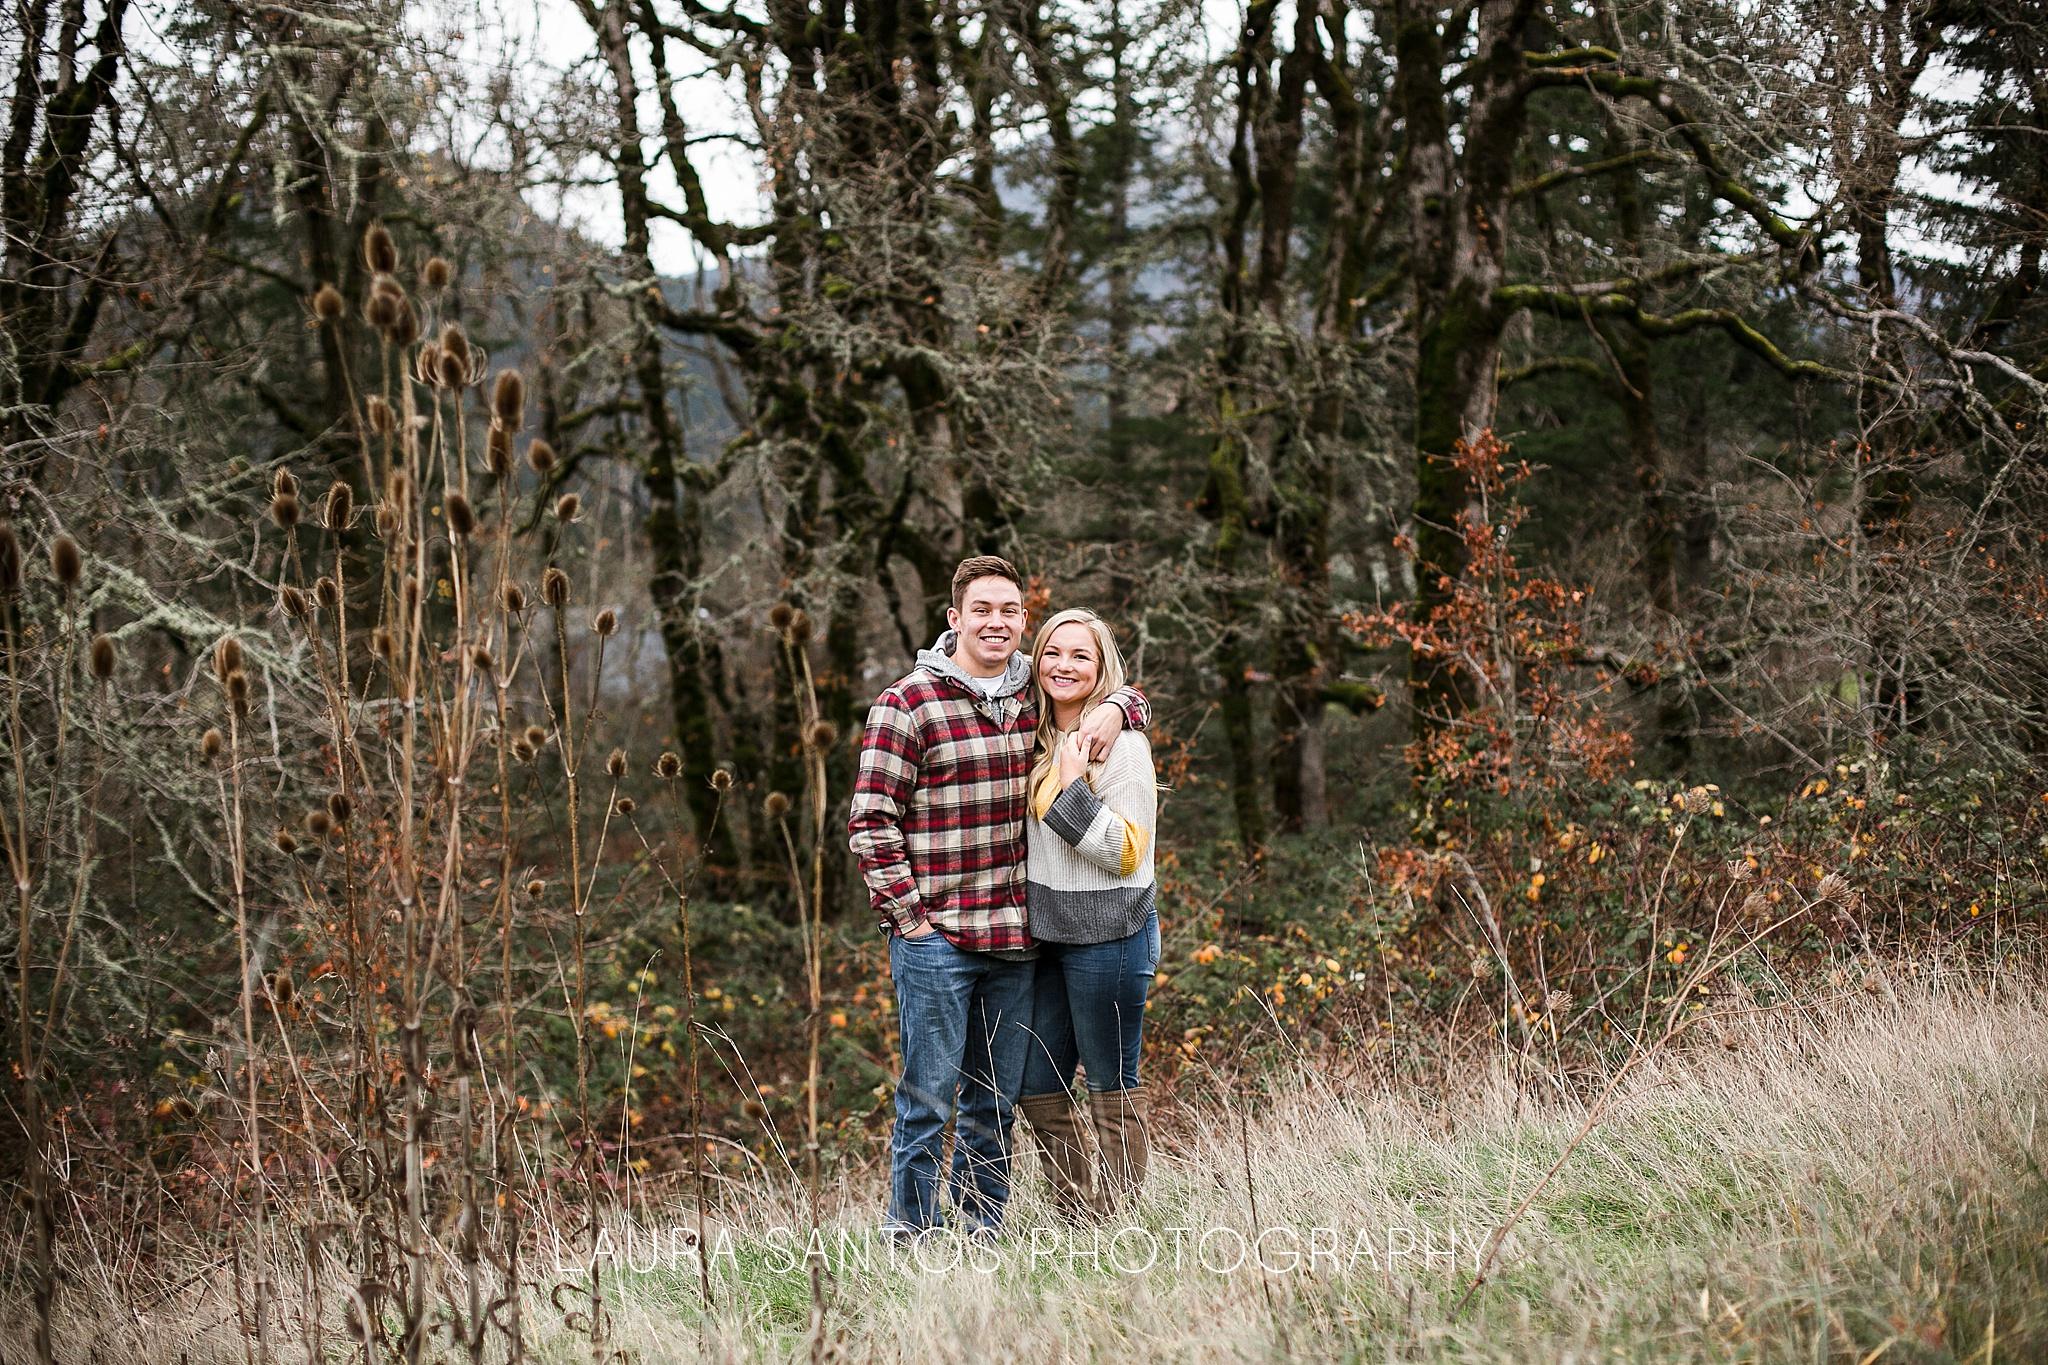 Laura Santos Photography Portland Oregon Family Photographer_0566.jpg